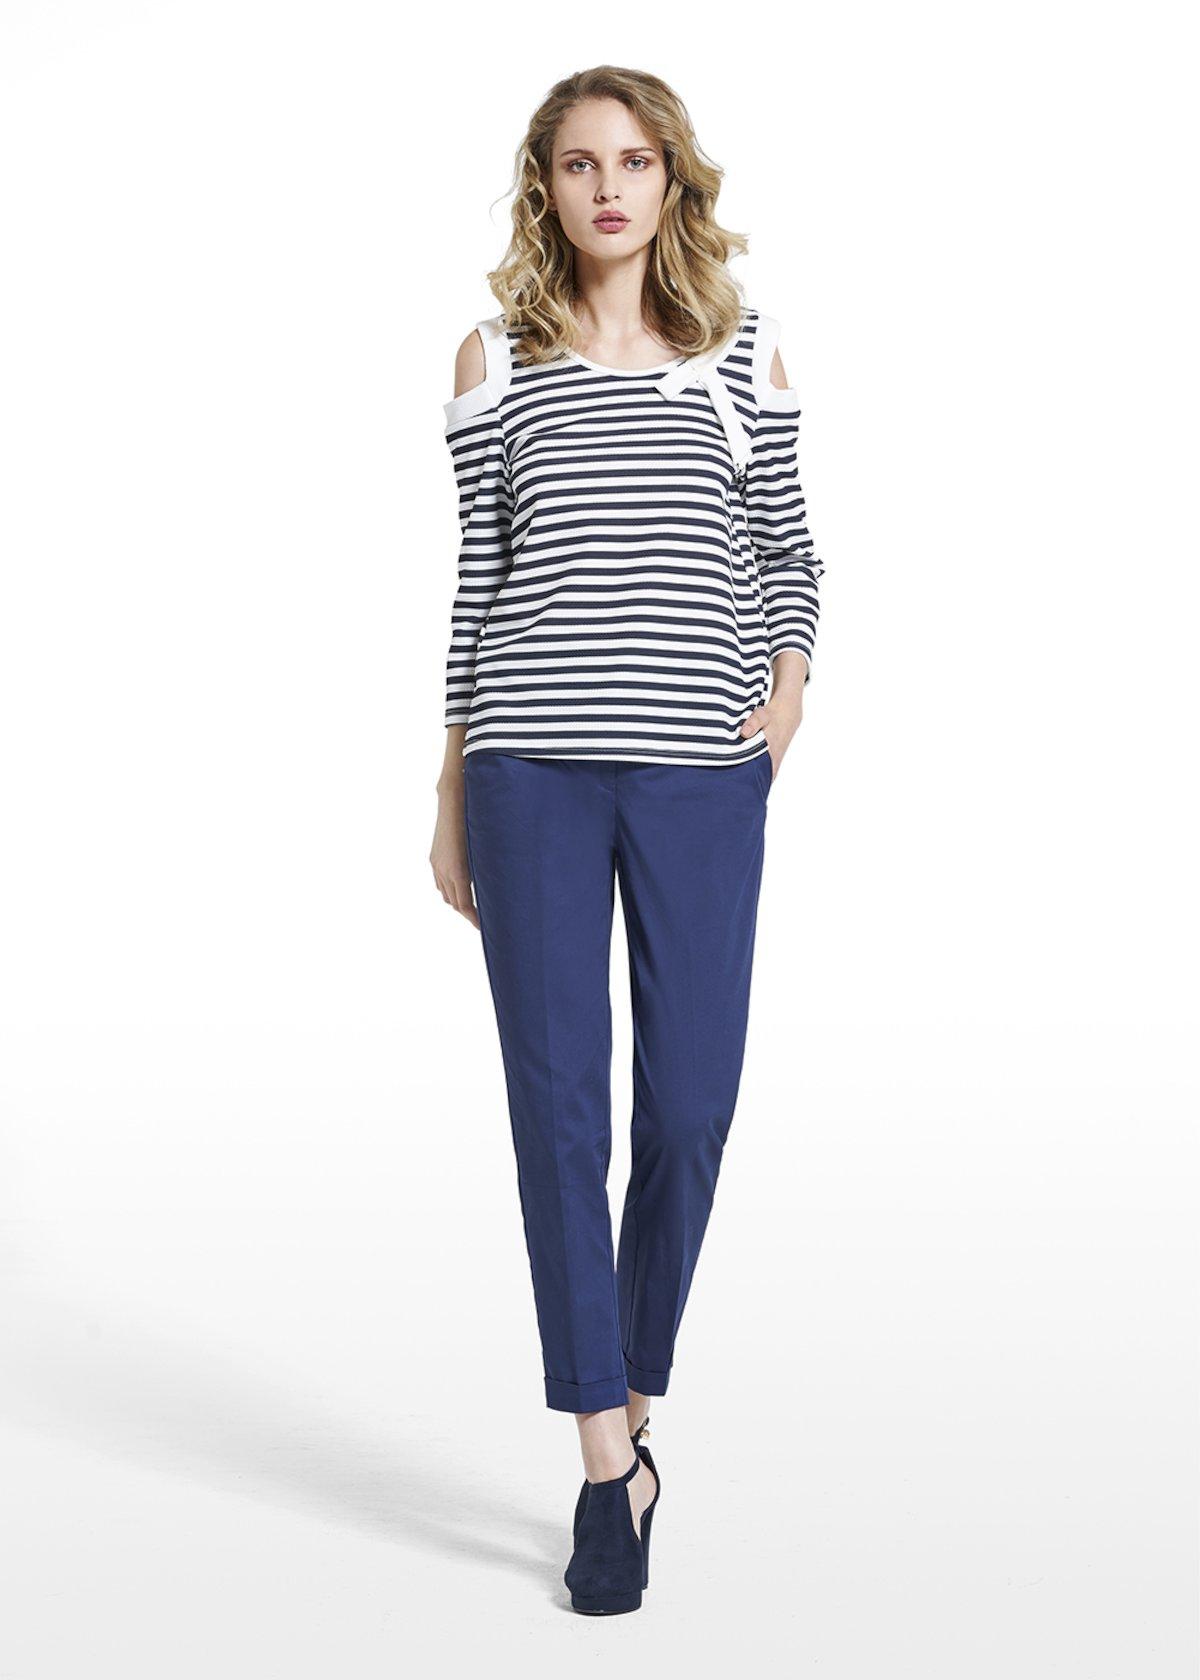 Scherry T-shirt fantasy stripes with bow - Black / White Stripes - Woman